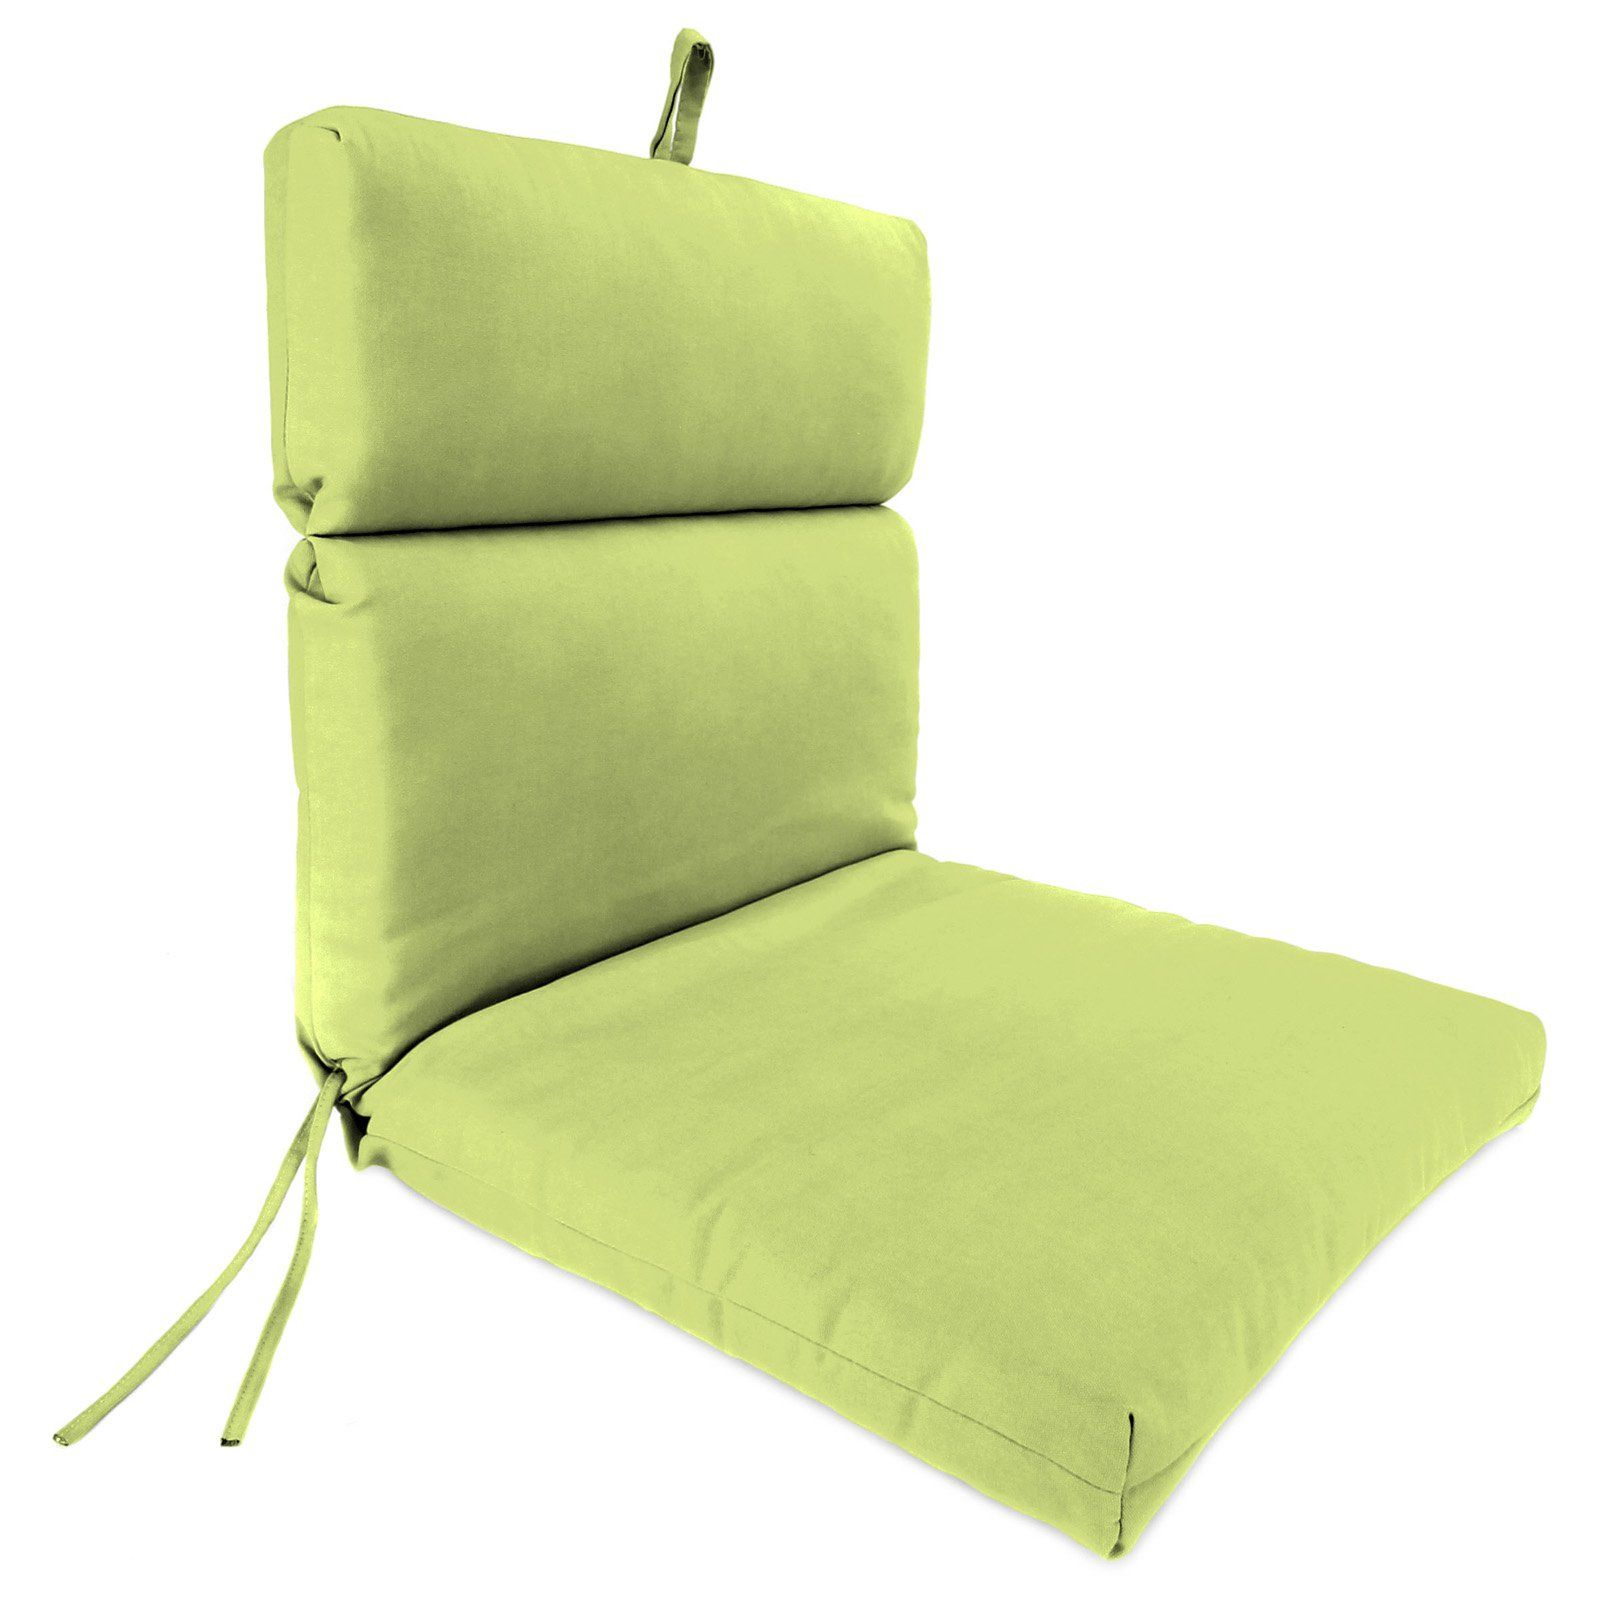 Jordan Manufacturing Sunbrella 22w X 44d In Outdoor Chair Cushion